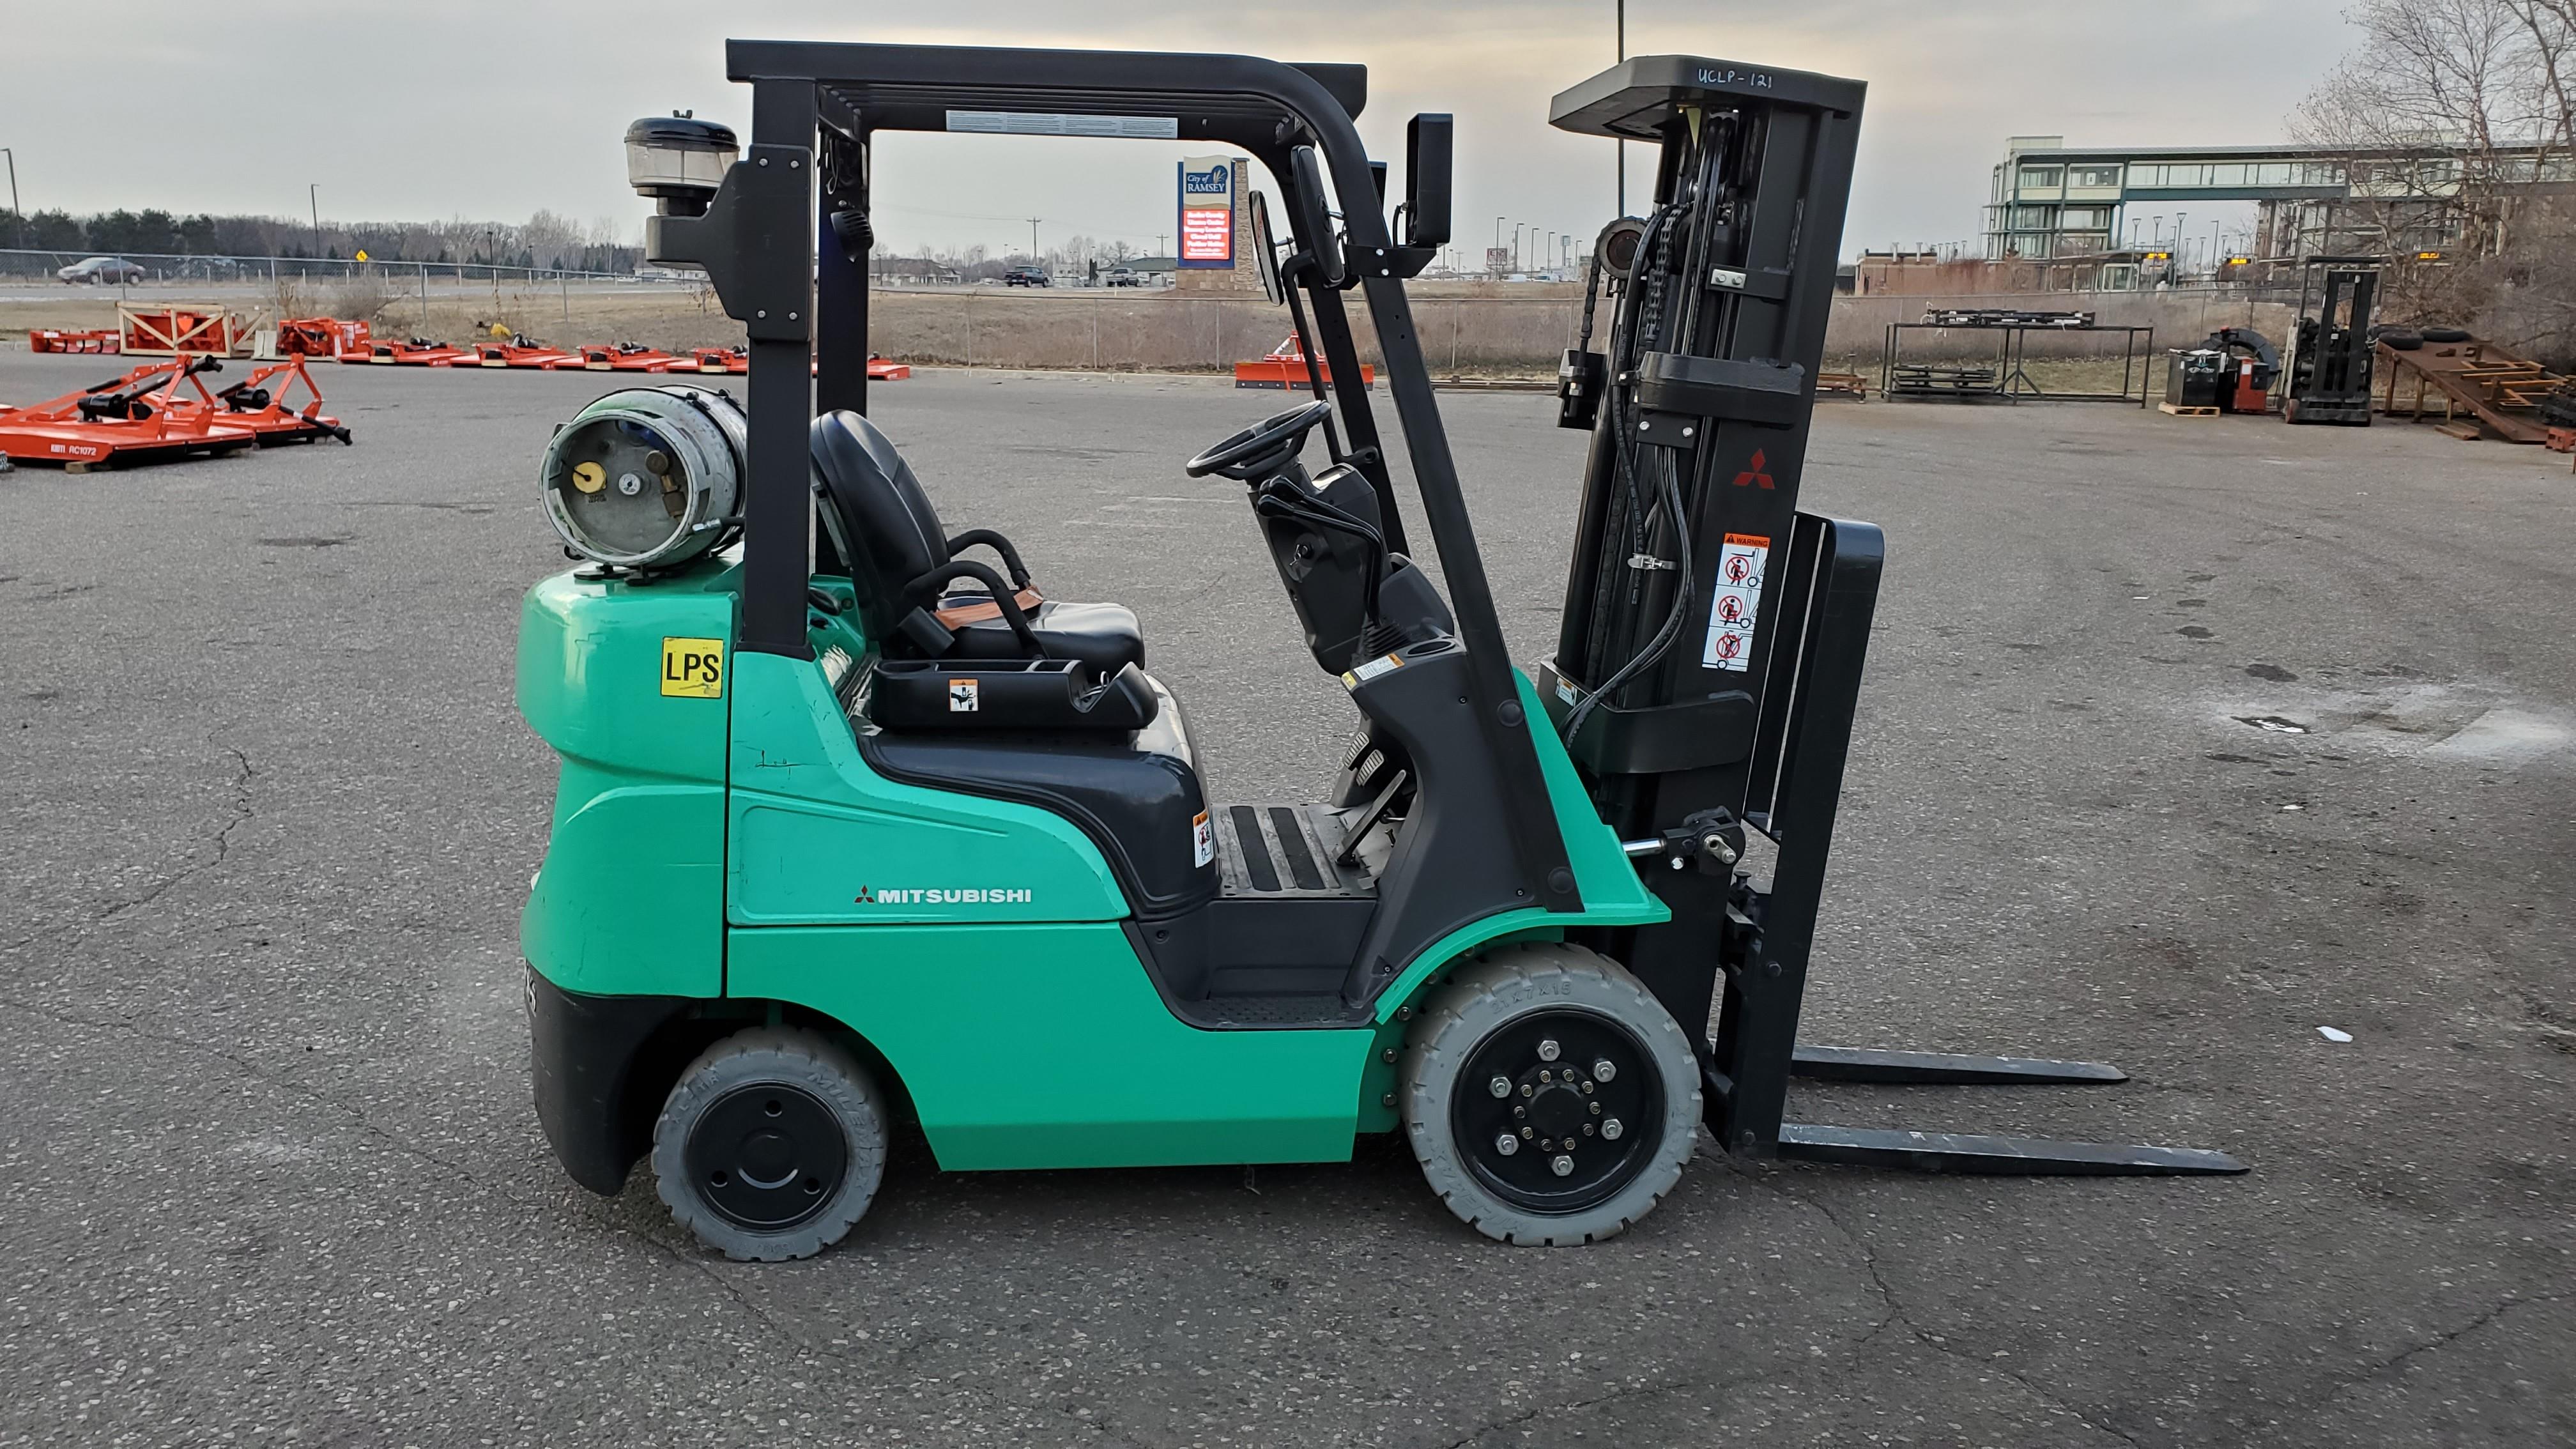 Used, 2015, Mitsubishi Forklift, FG25N4, Forklifts / Lift Trucks